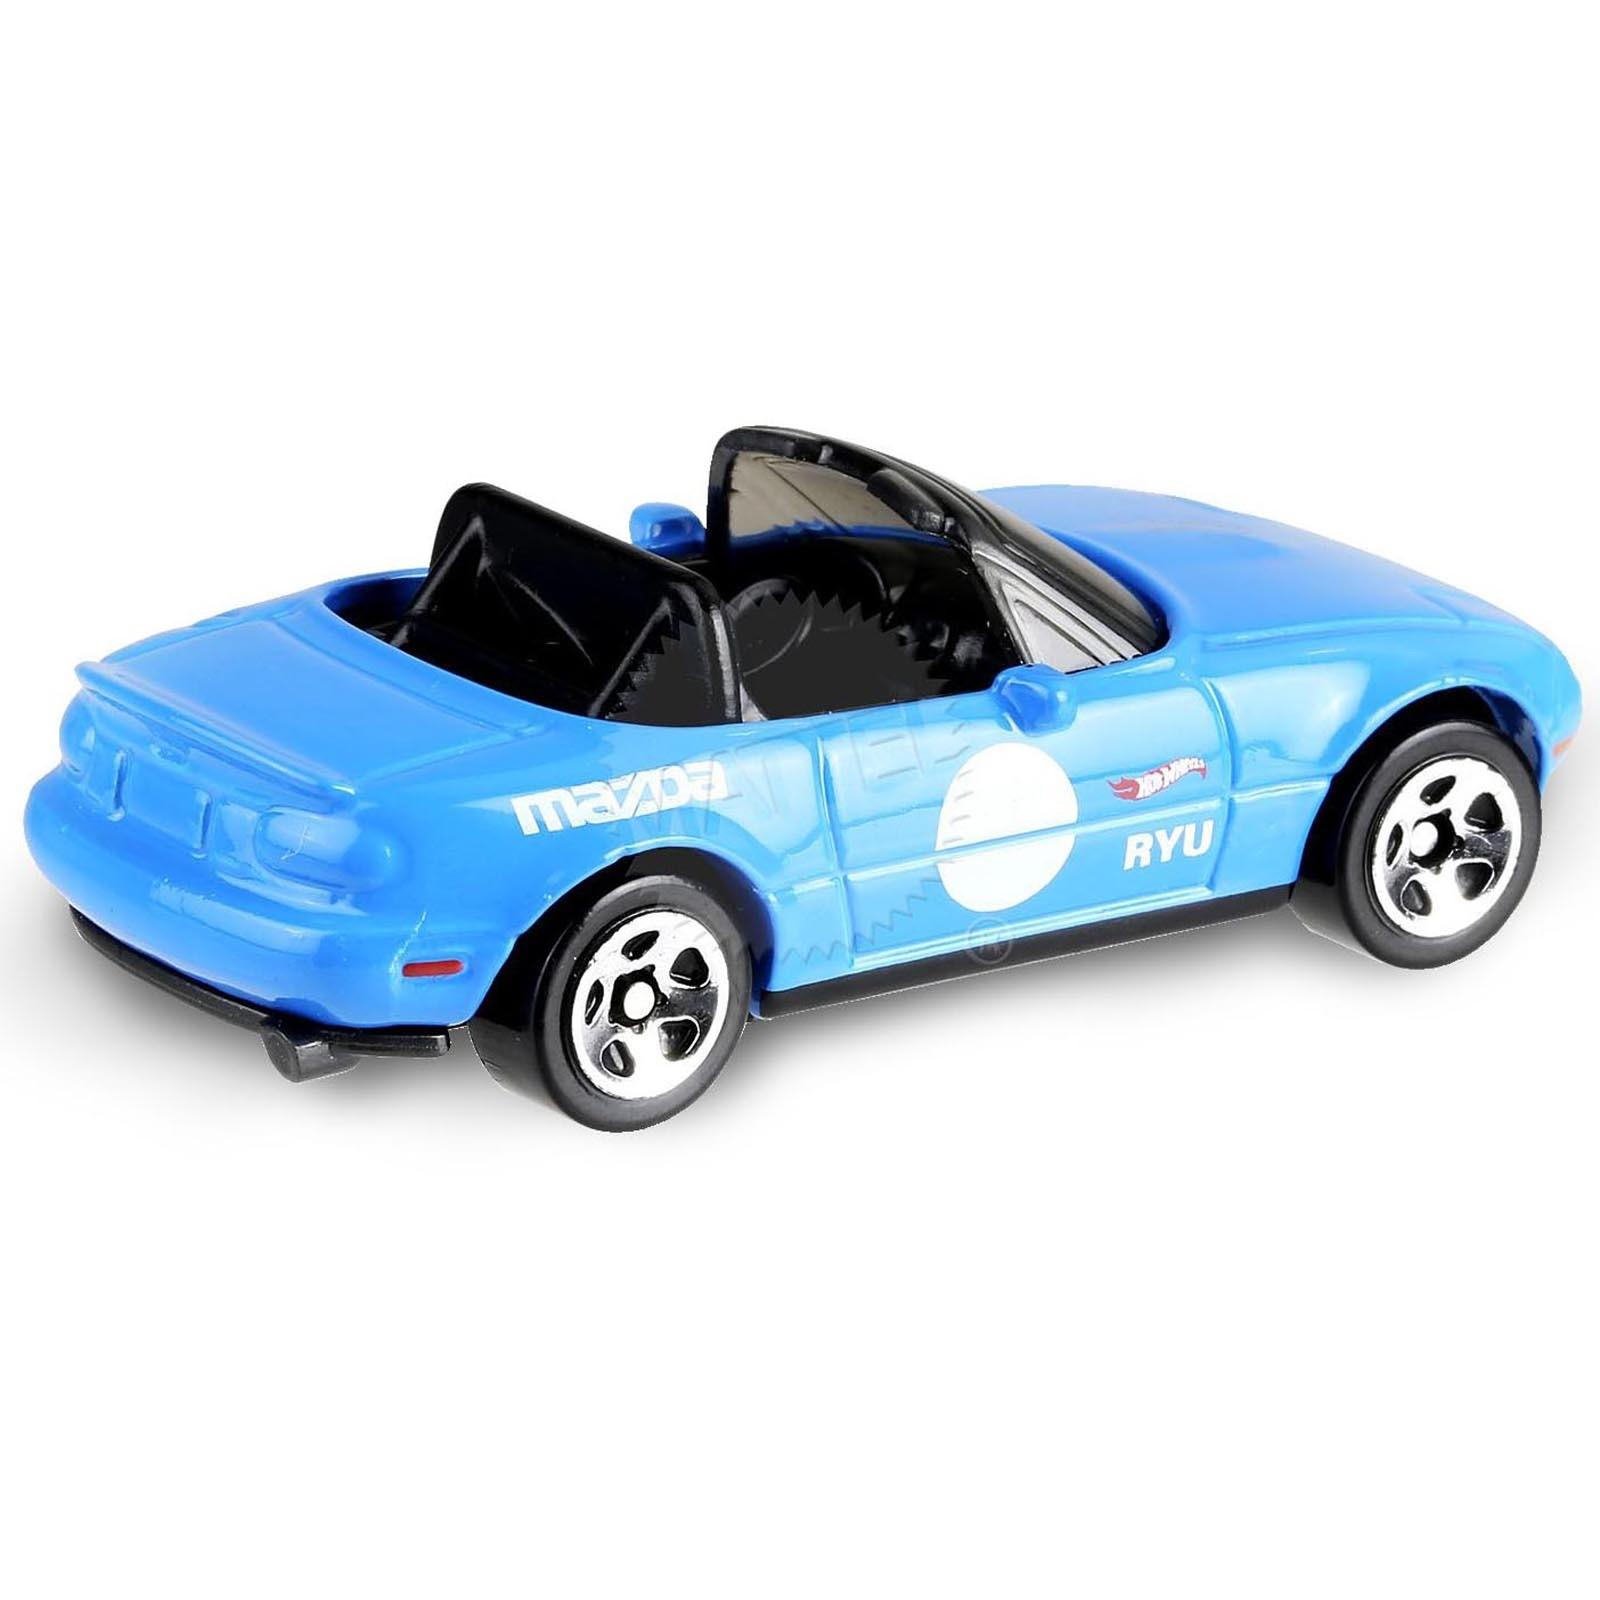 Hot Wheels - '91 Mazda MX - 5 Miata - FYB66